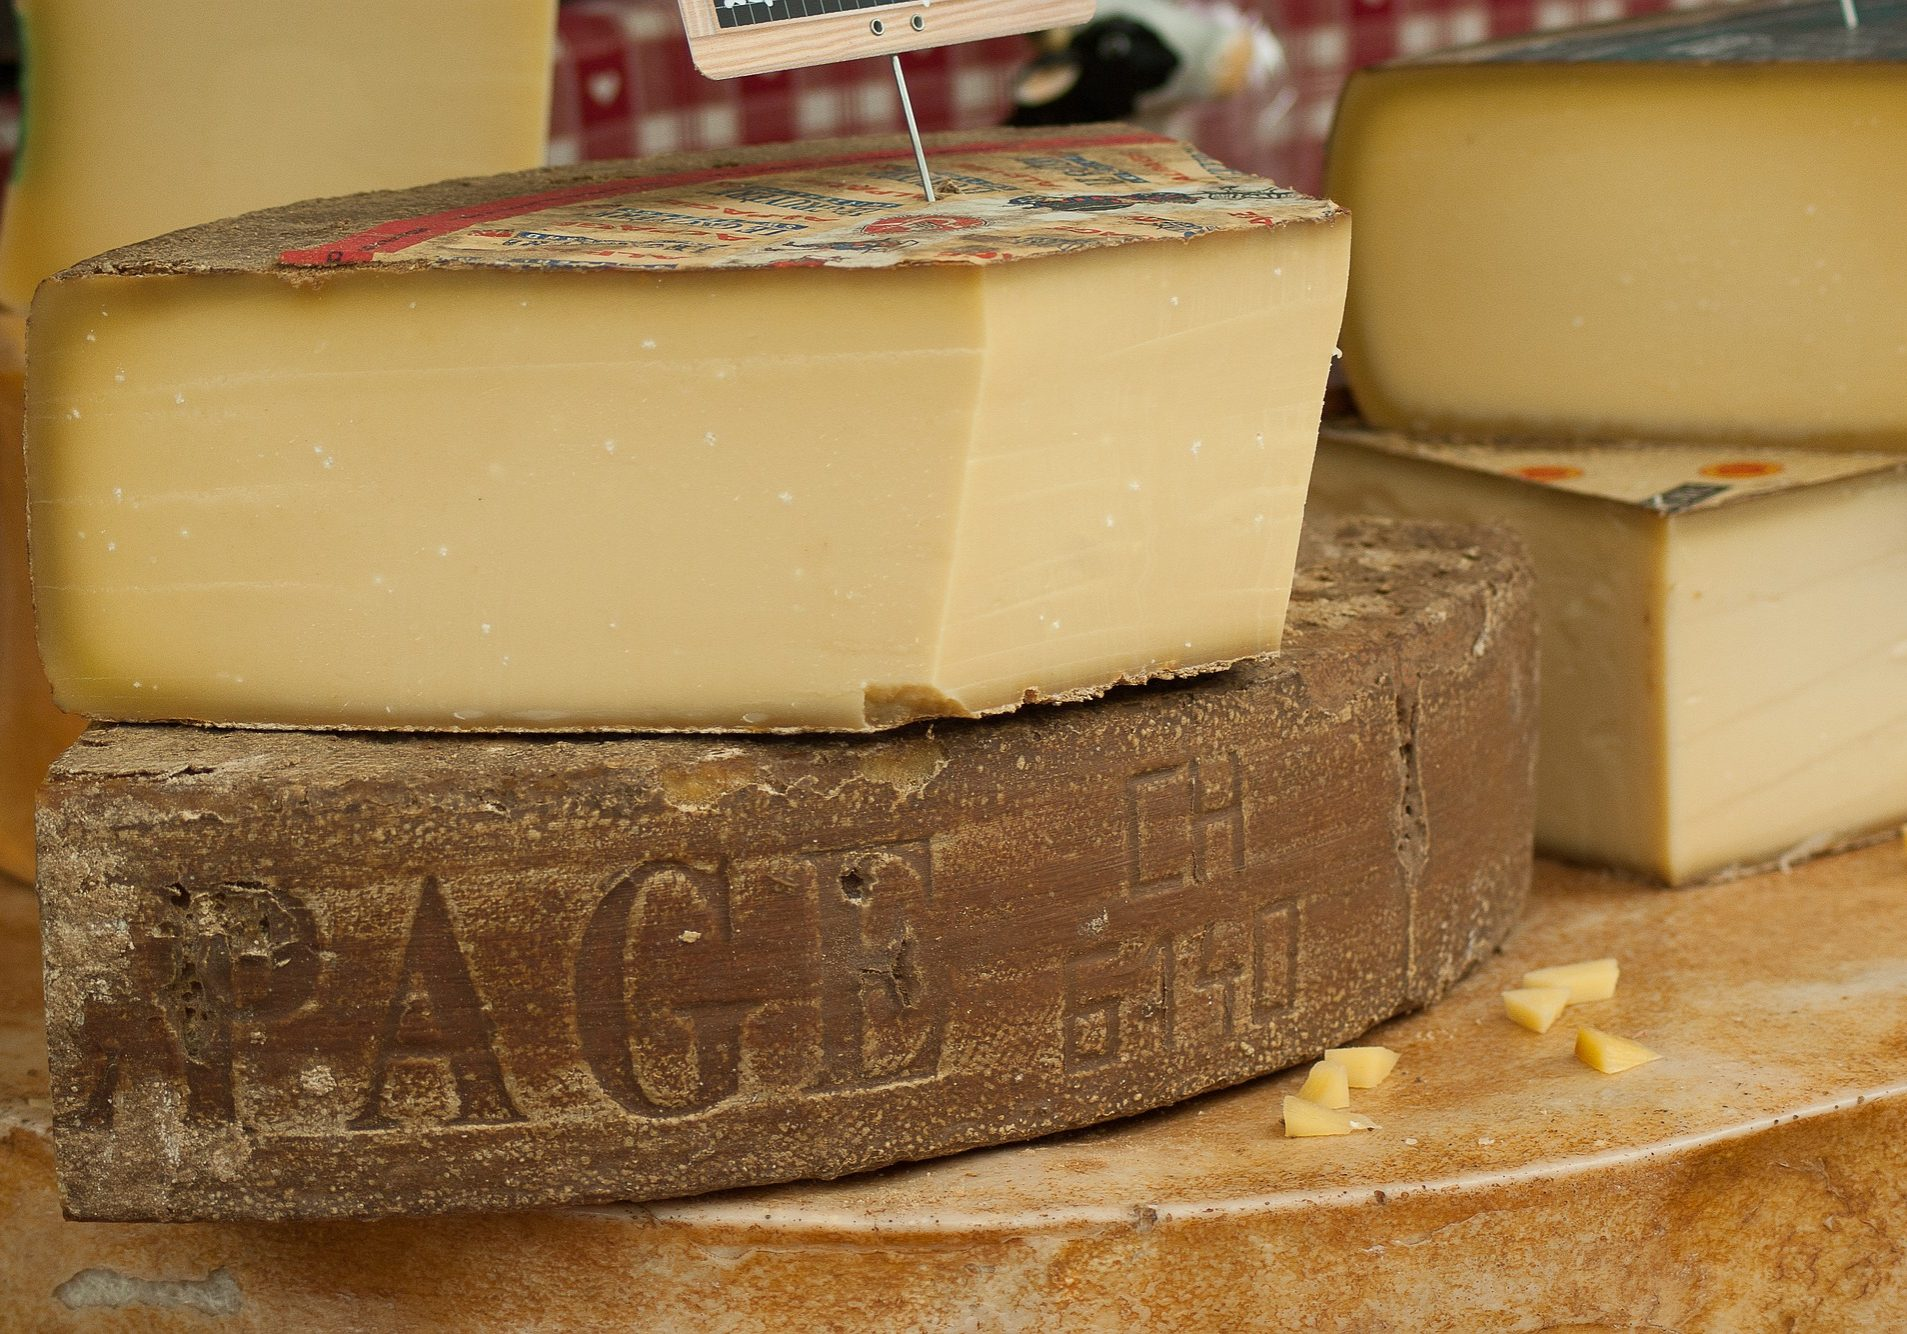 cheese-2368695_1920